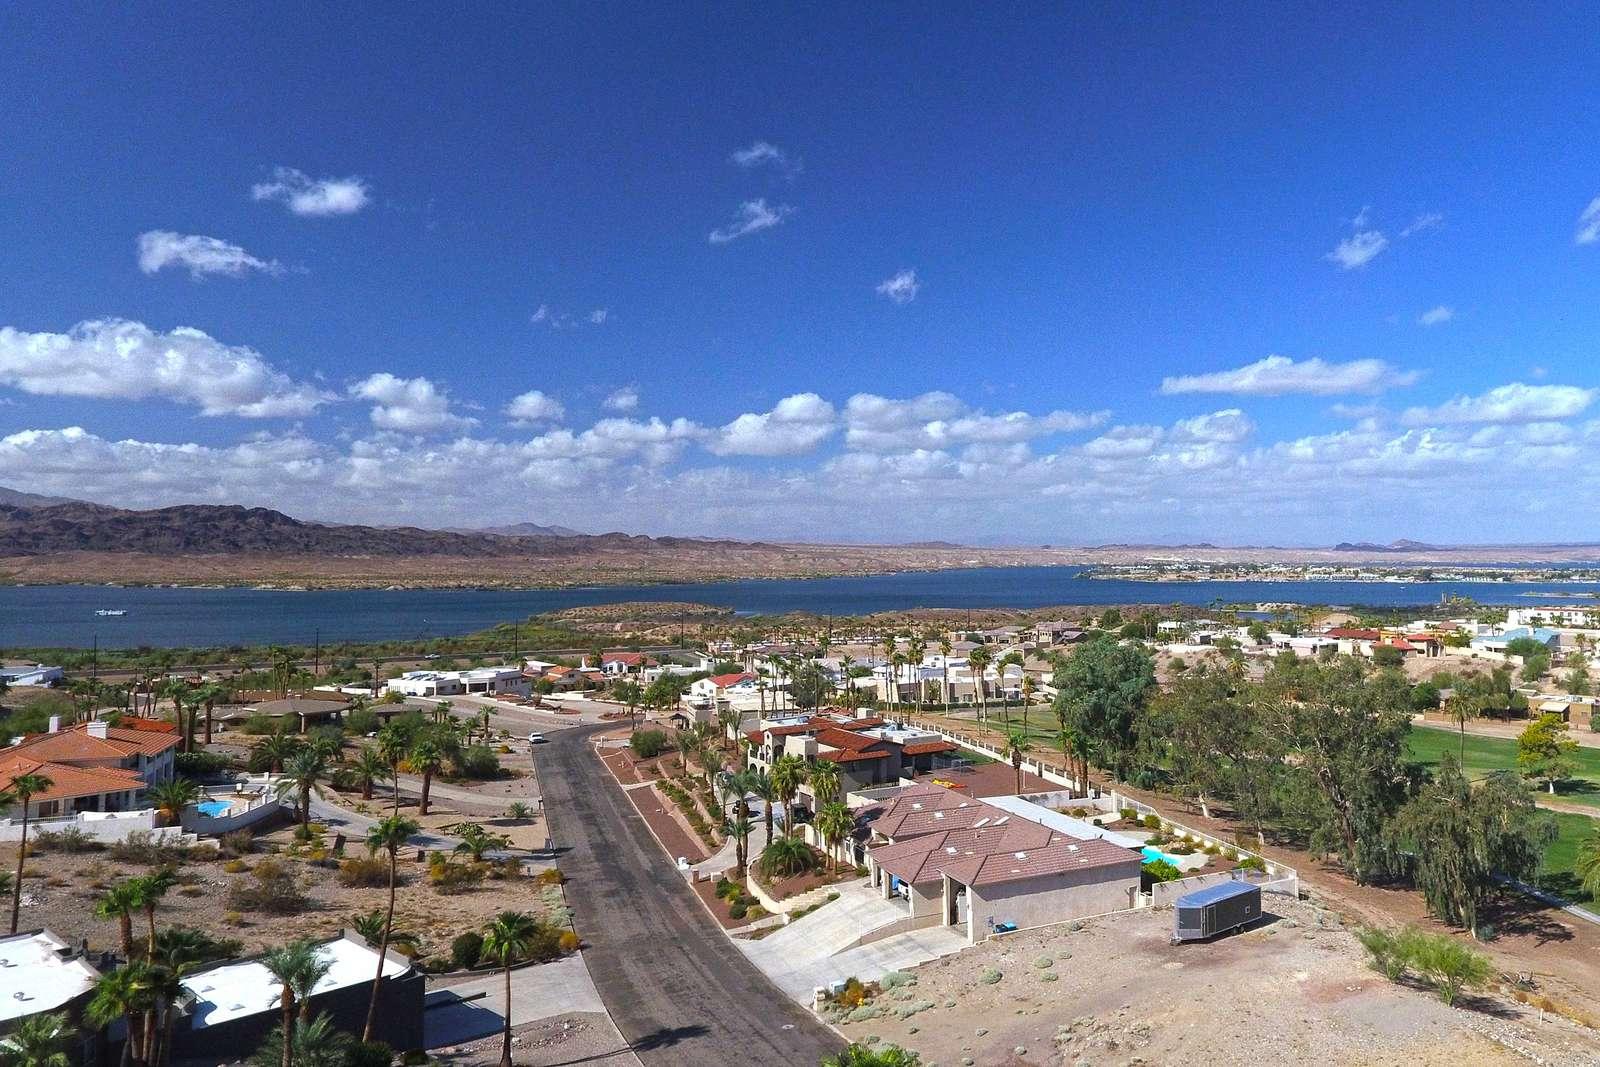 Drone pic of lake view